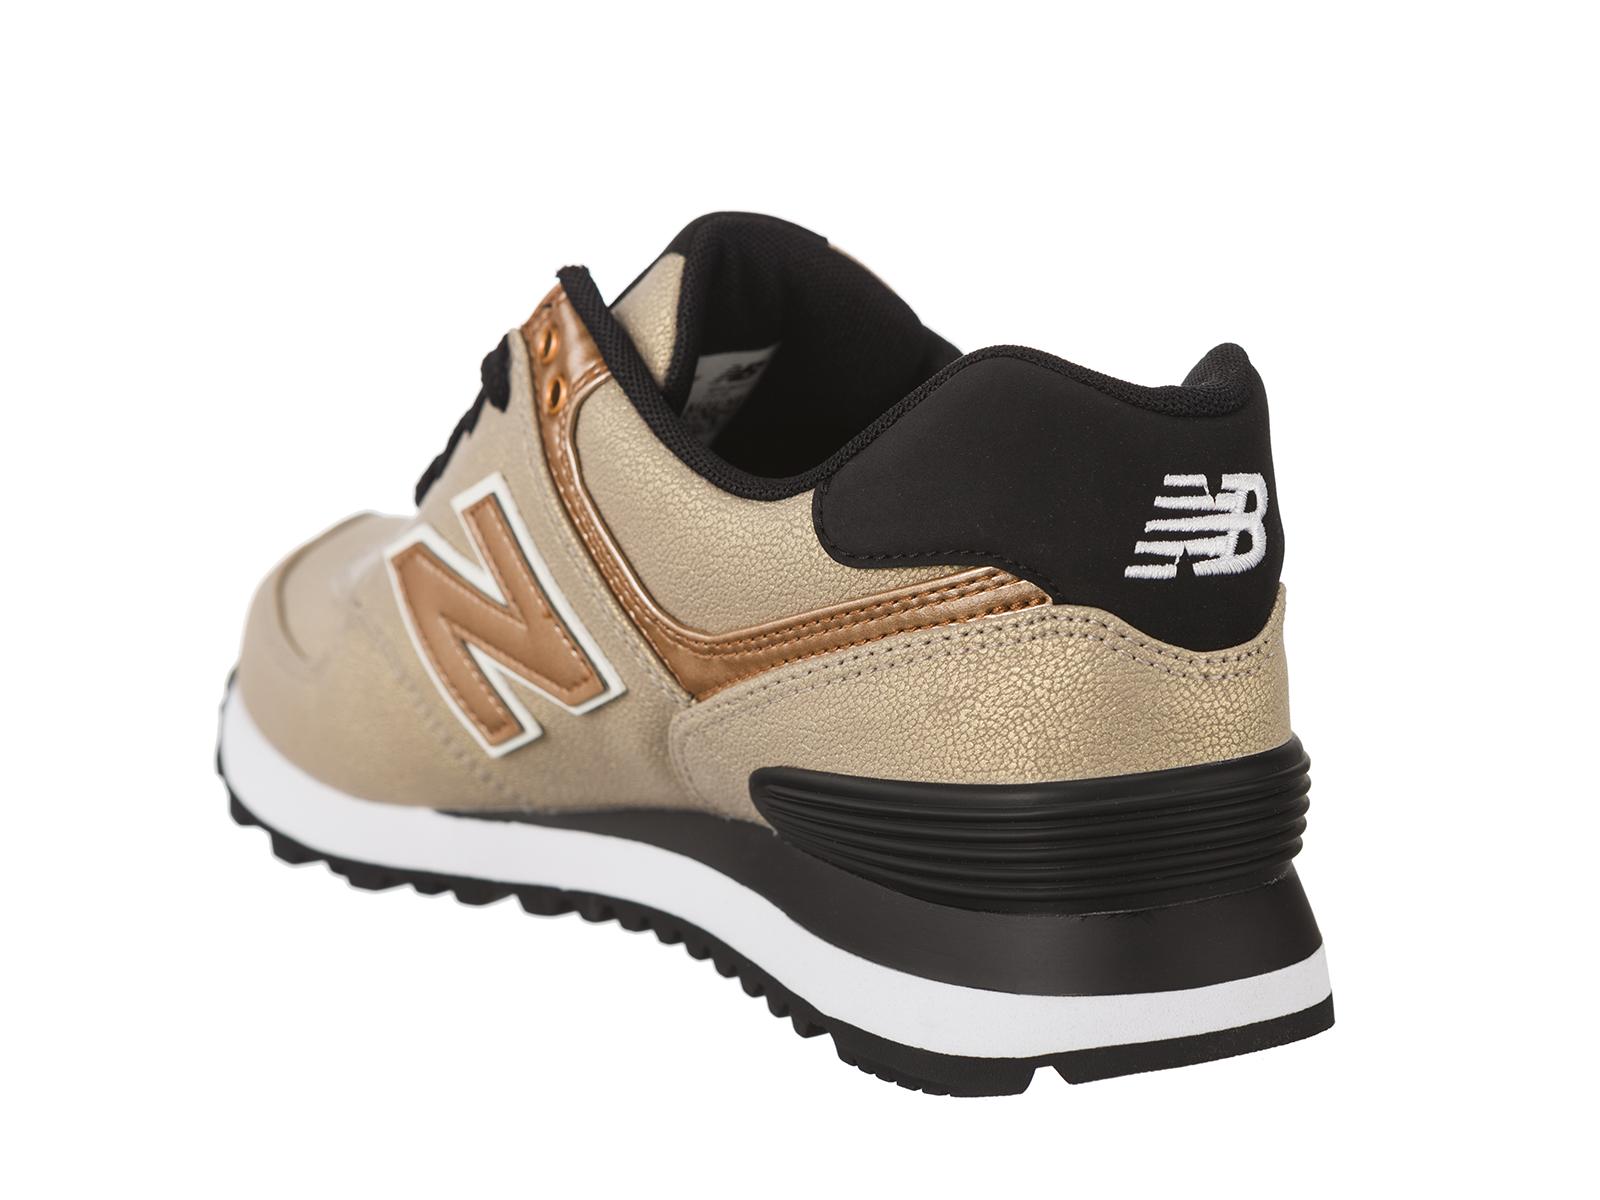 New Balance Donna WL574 Scarpe Da Ginnastica Stringate Suola Zigrinata Sneakers